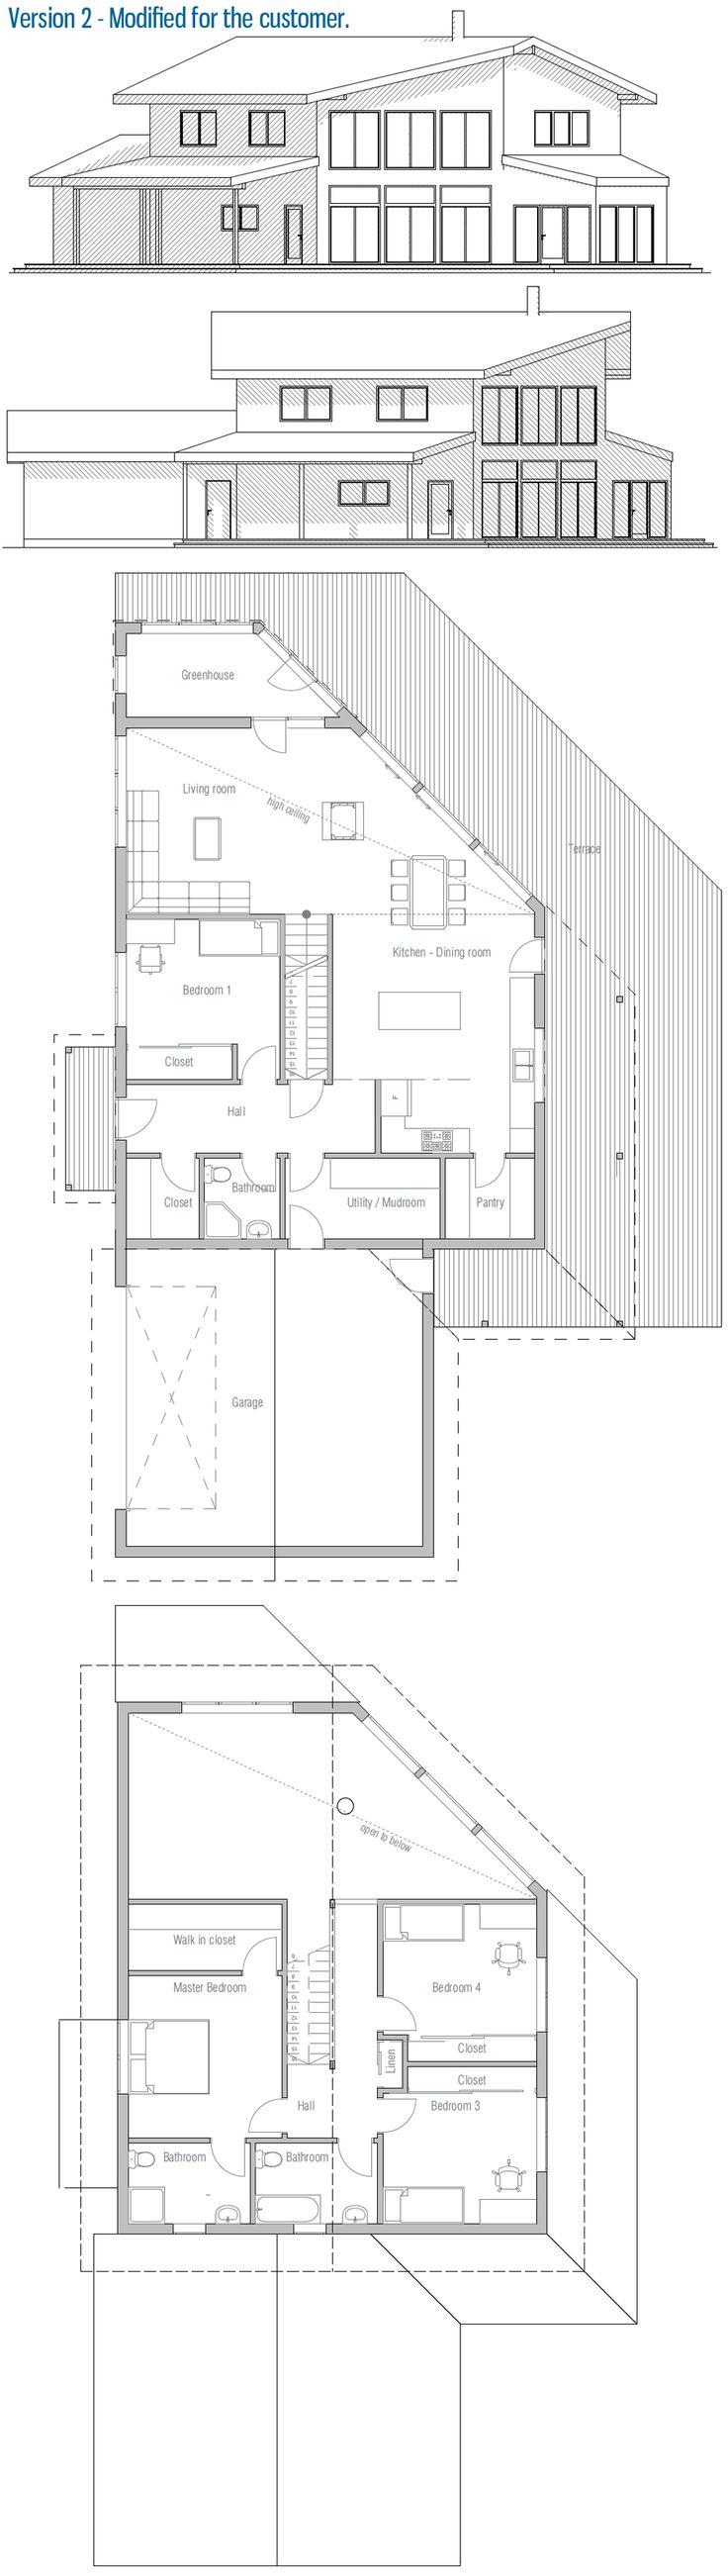 Customer House / Modified home plan